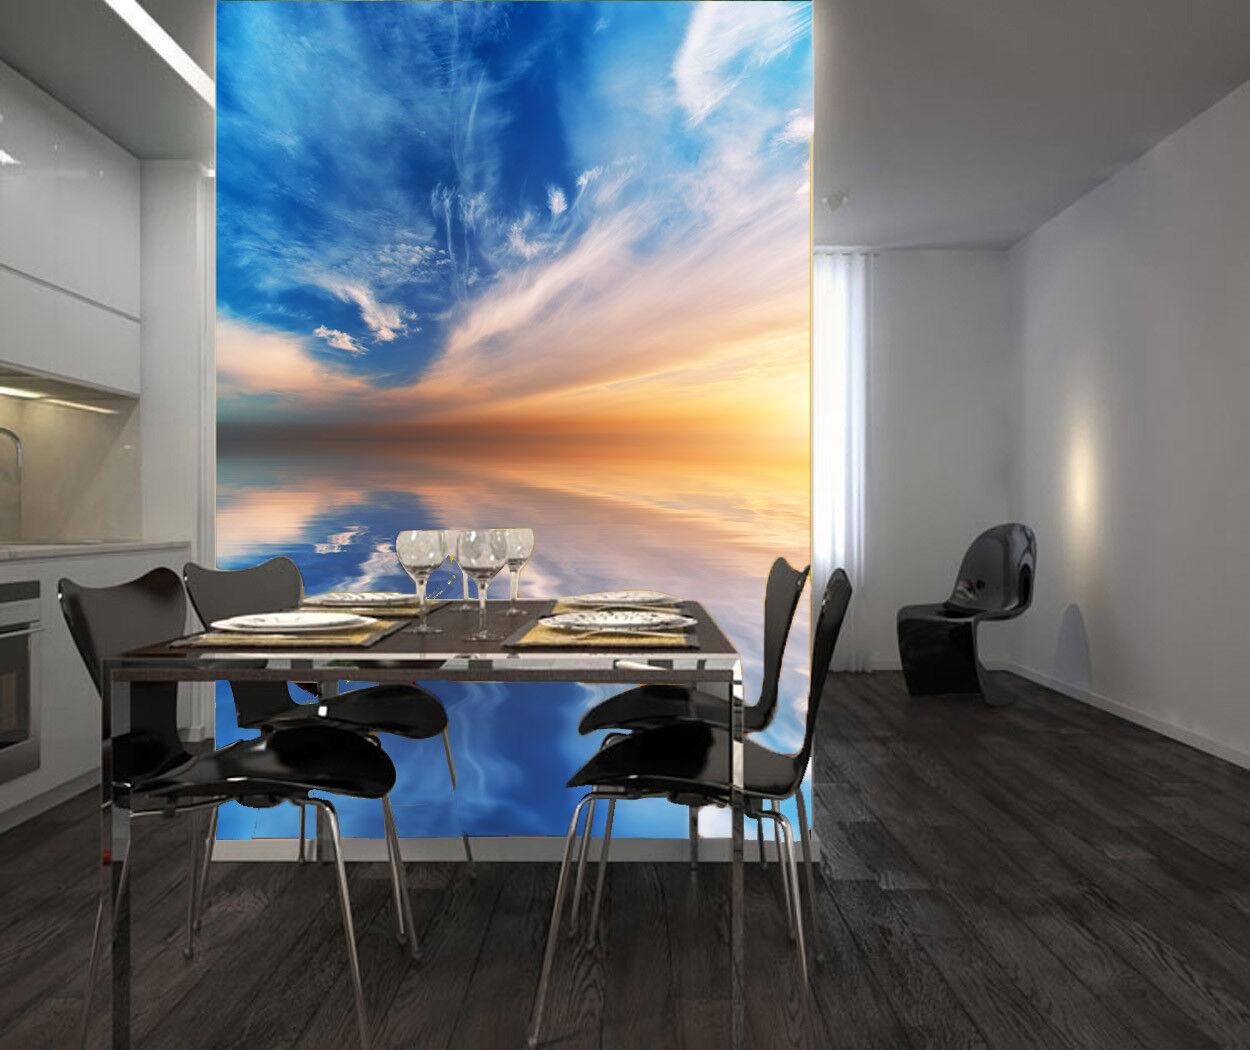 3D Bule Cloud 451 Wallpaper Murals Wall Print Wall Mural AJ WALL AU Summer